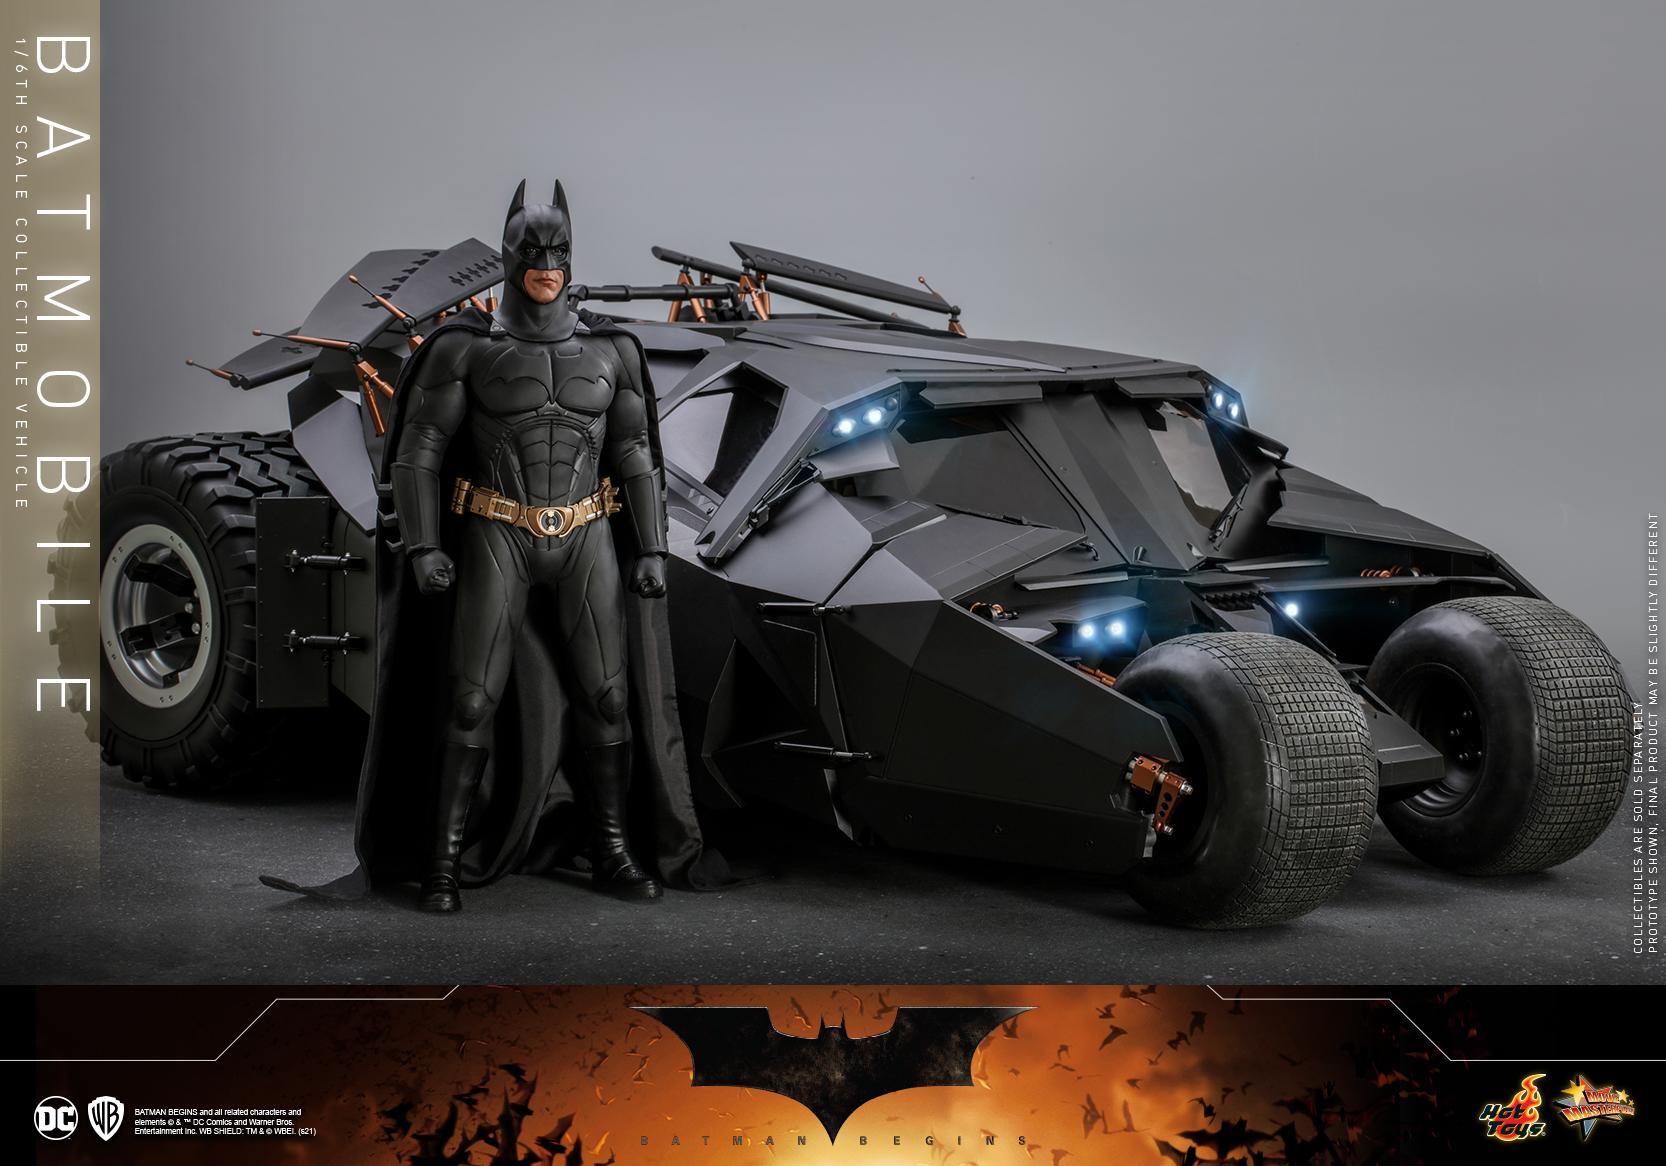 Hot Toys - Batman Begins - Batmobile collectible Vehicle_PR3